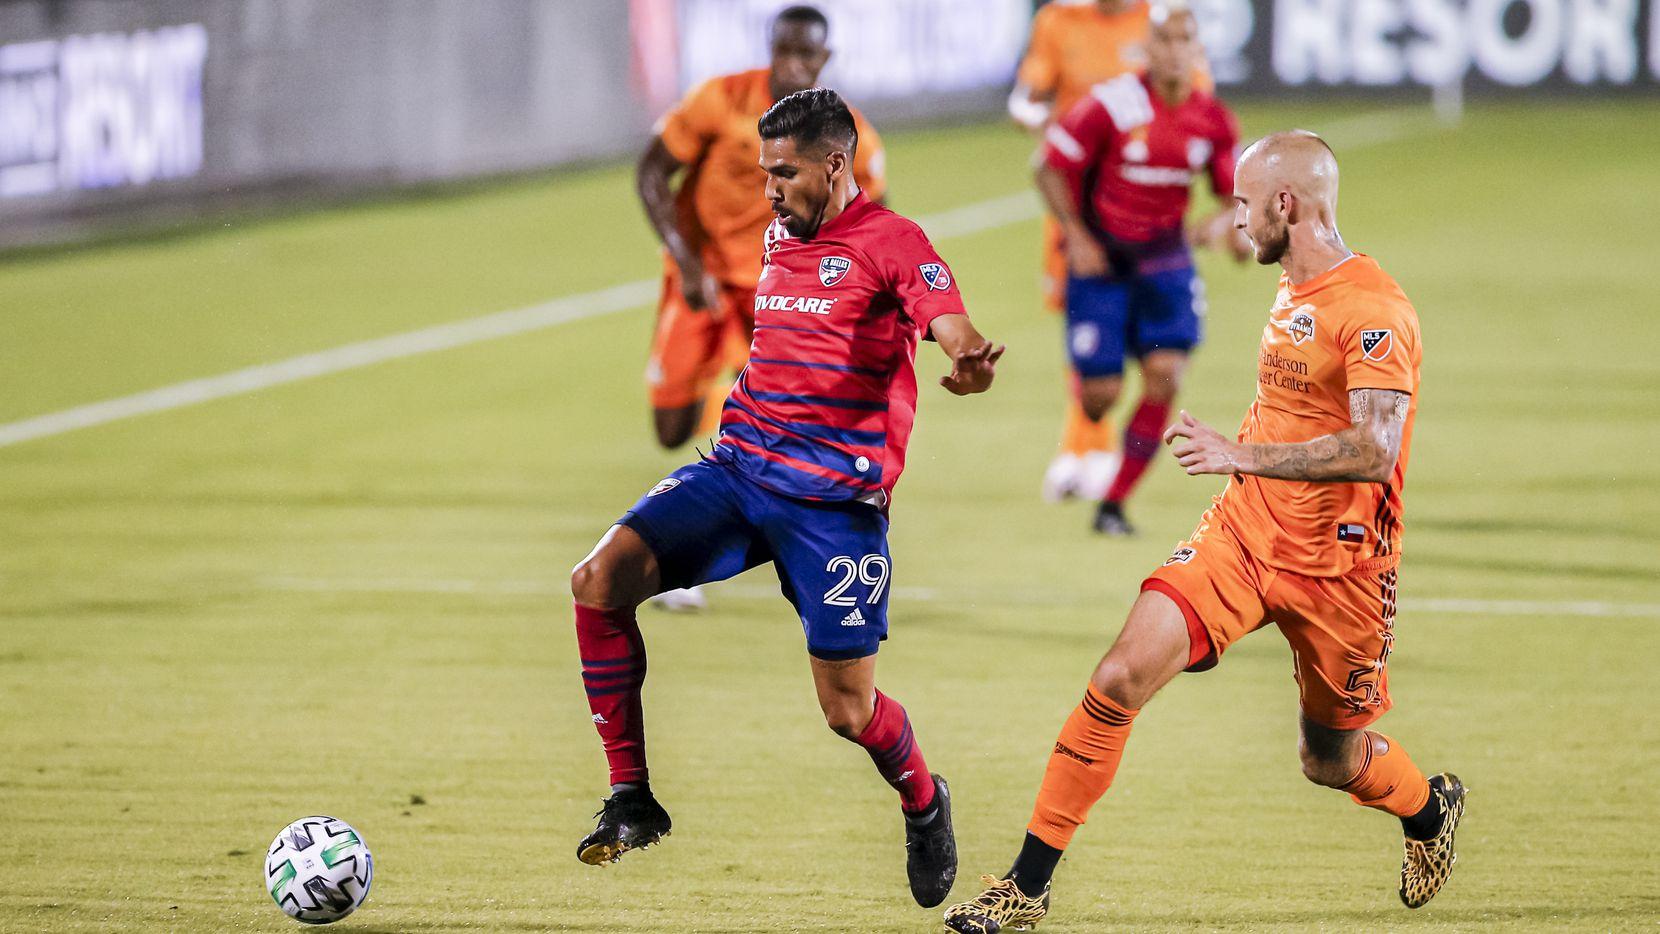 FC Dallas attacker Franco Jara (29) looks for room against Houston Dynamo defender Aljaz Struna (5) during the first half of an MLS soccer match at Toyota Stadium in Frisco, Saturday, September 12, 2020.